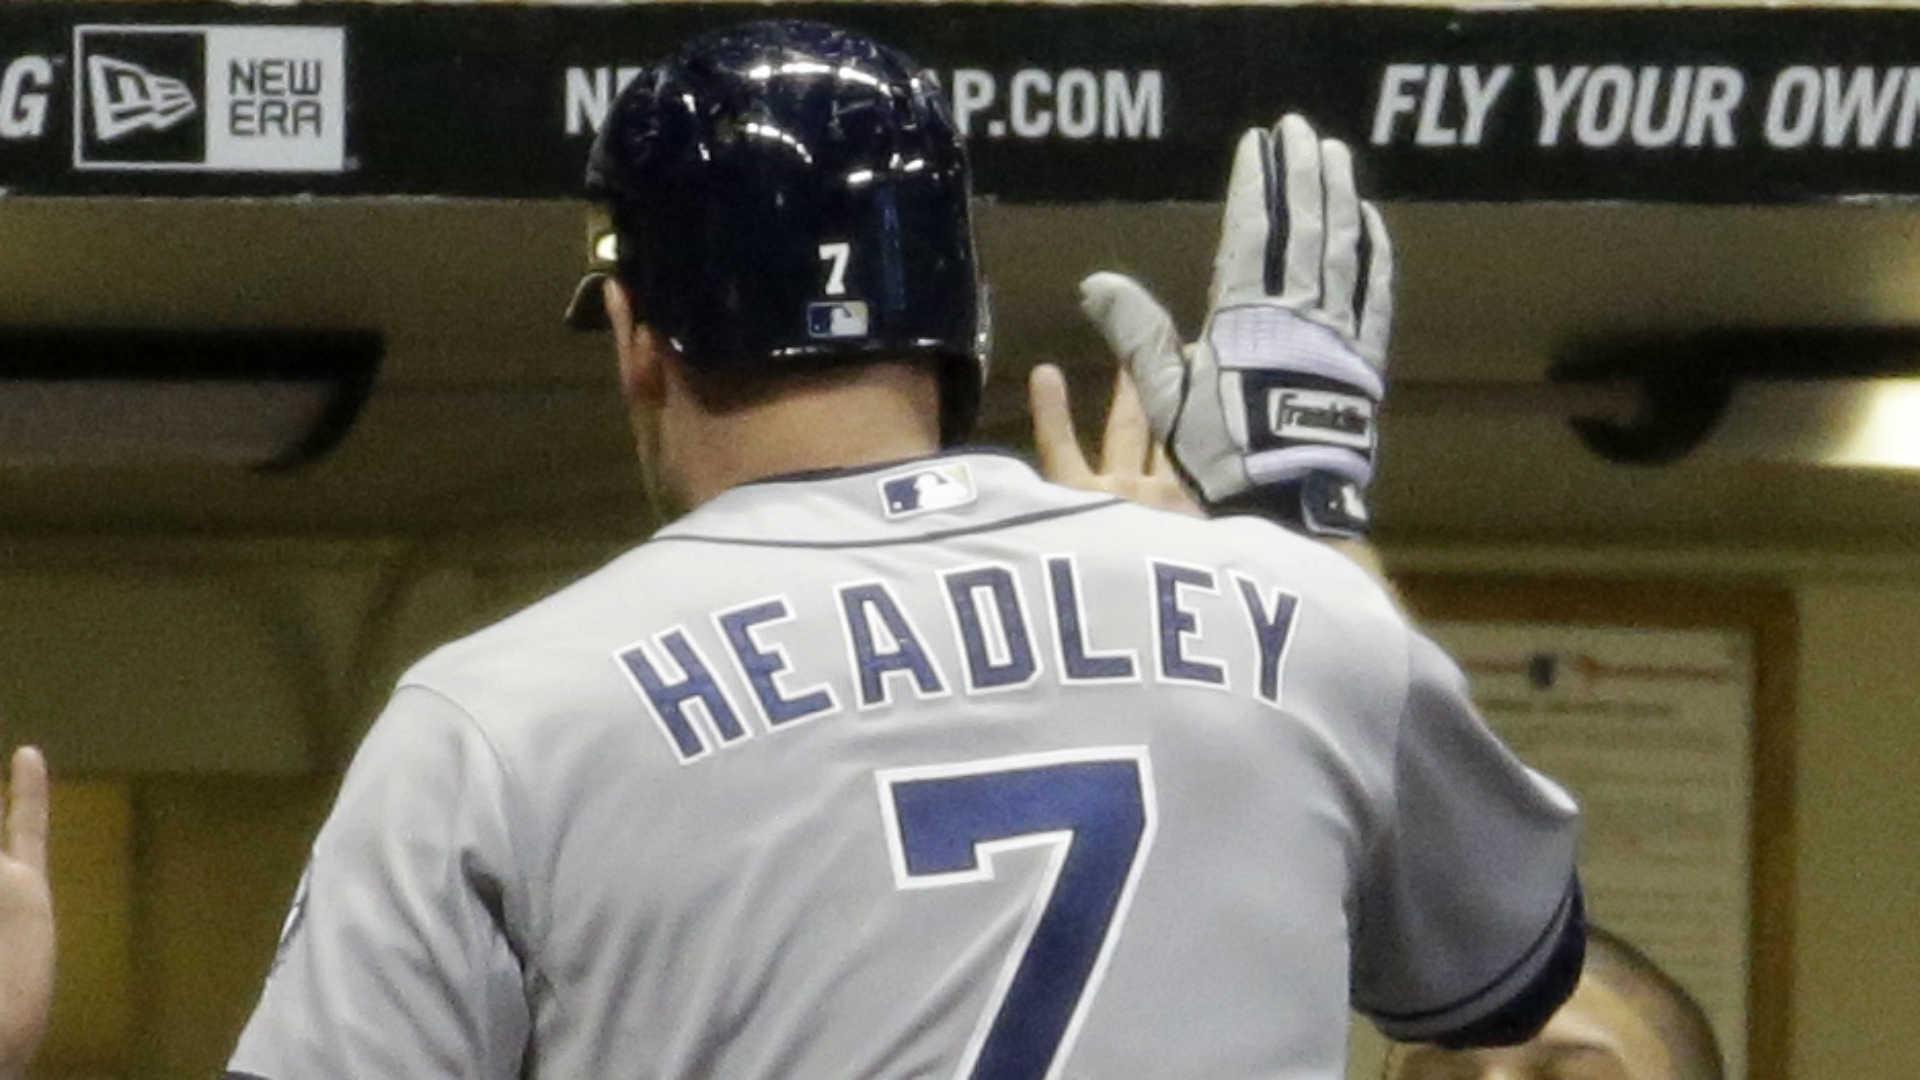 Chase Headley-041424-AP-FTR.jpg